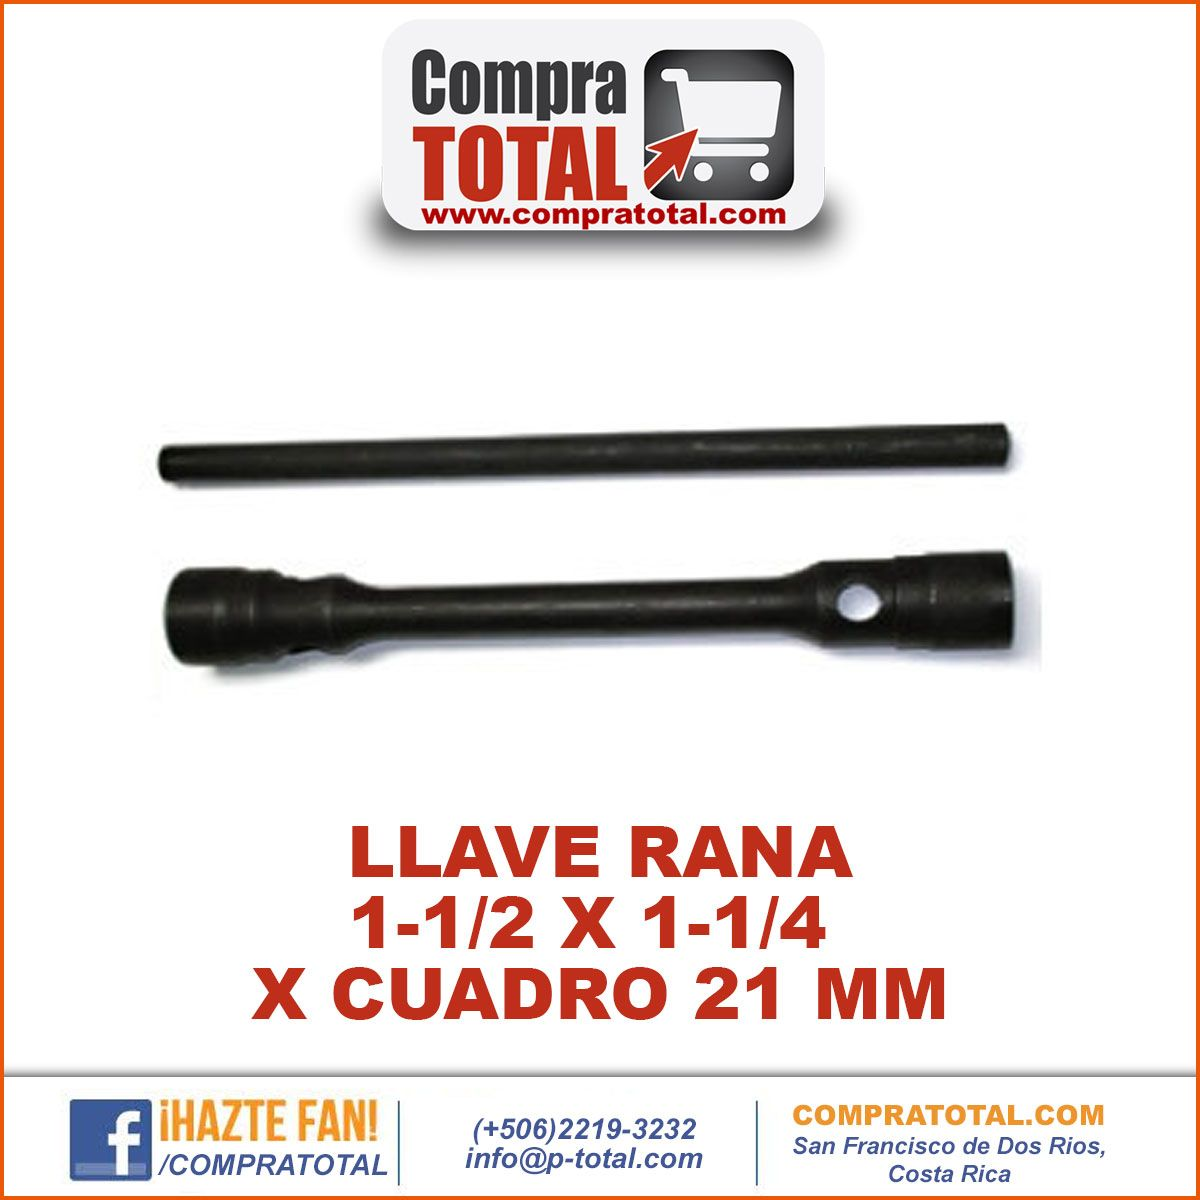 #CompraTotal - #HerramientaManualCostaRica LLAVE RANA 1-1/2 X 1-1/4 X CUADRO 21 MM